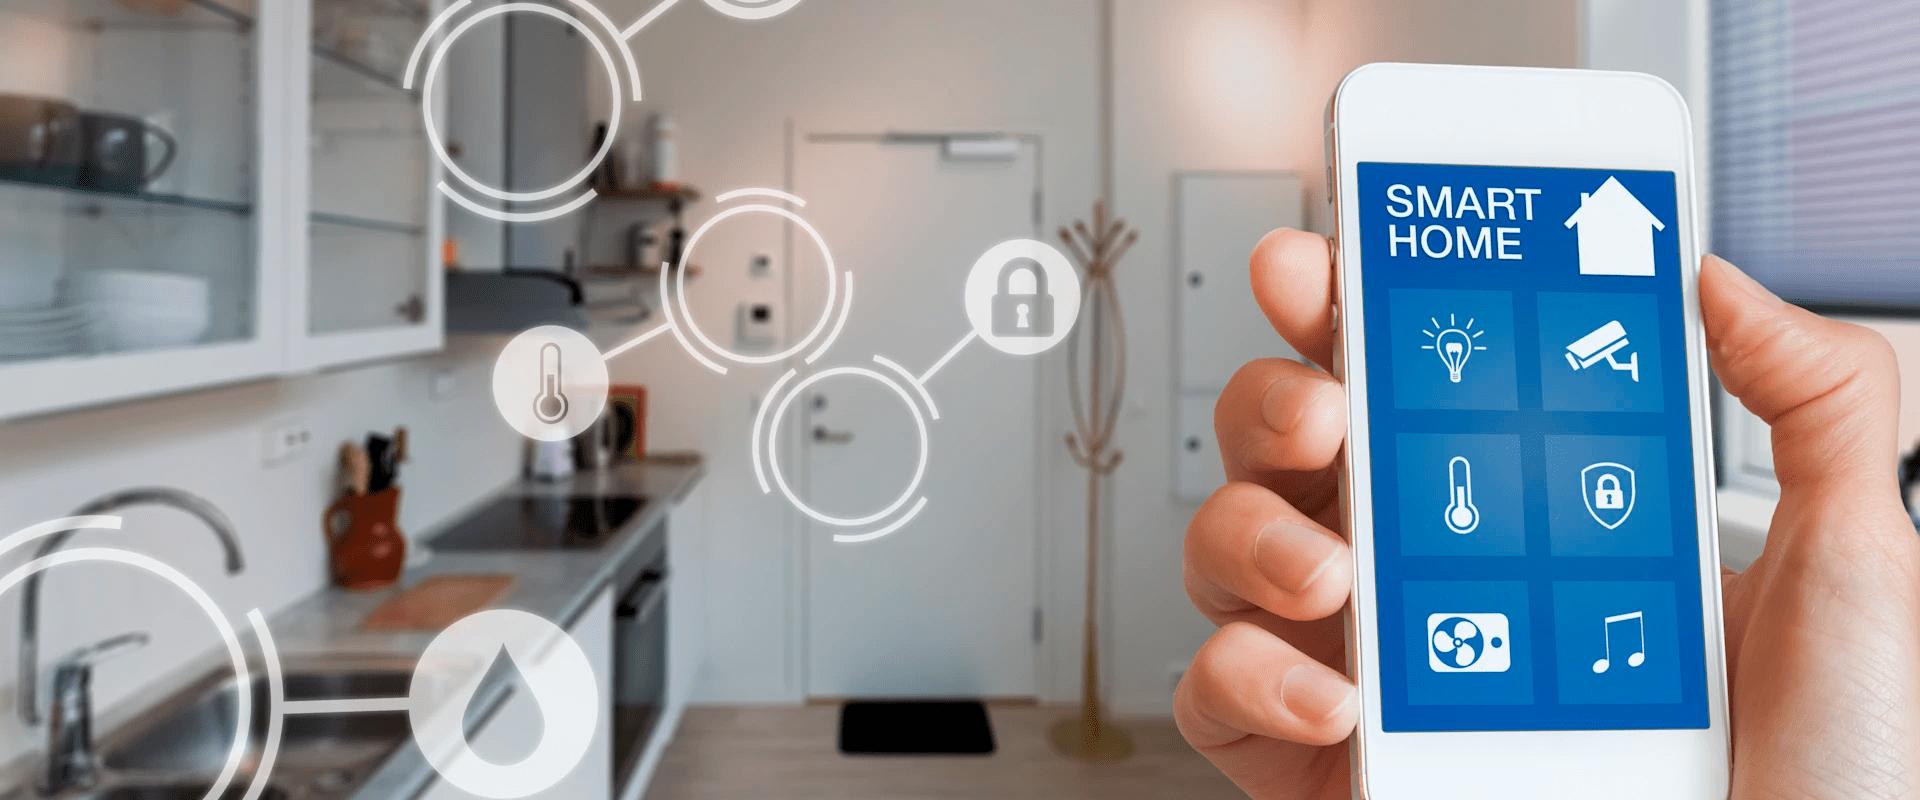 Tendencias Smart Home